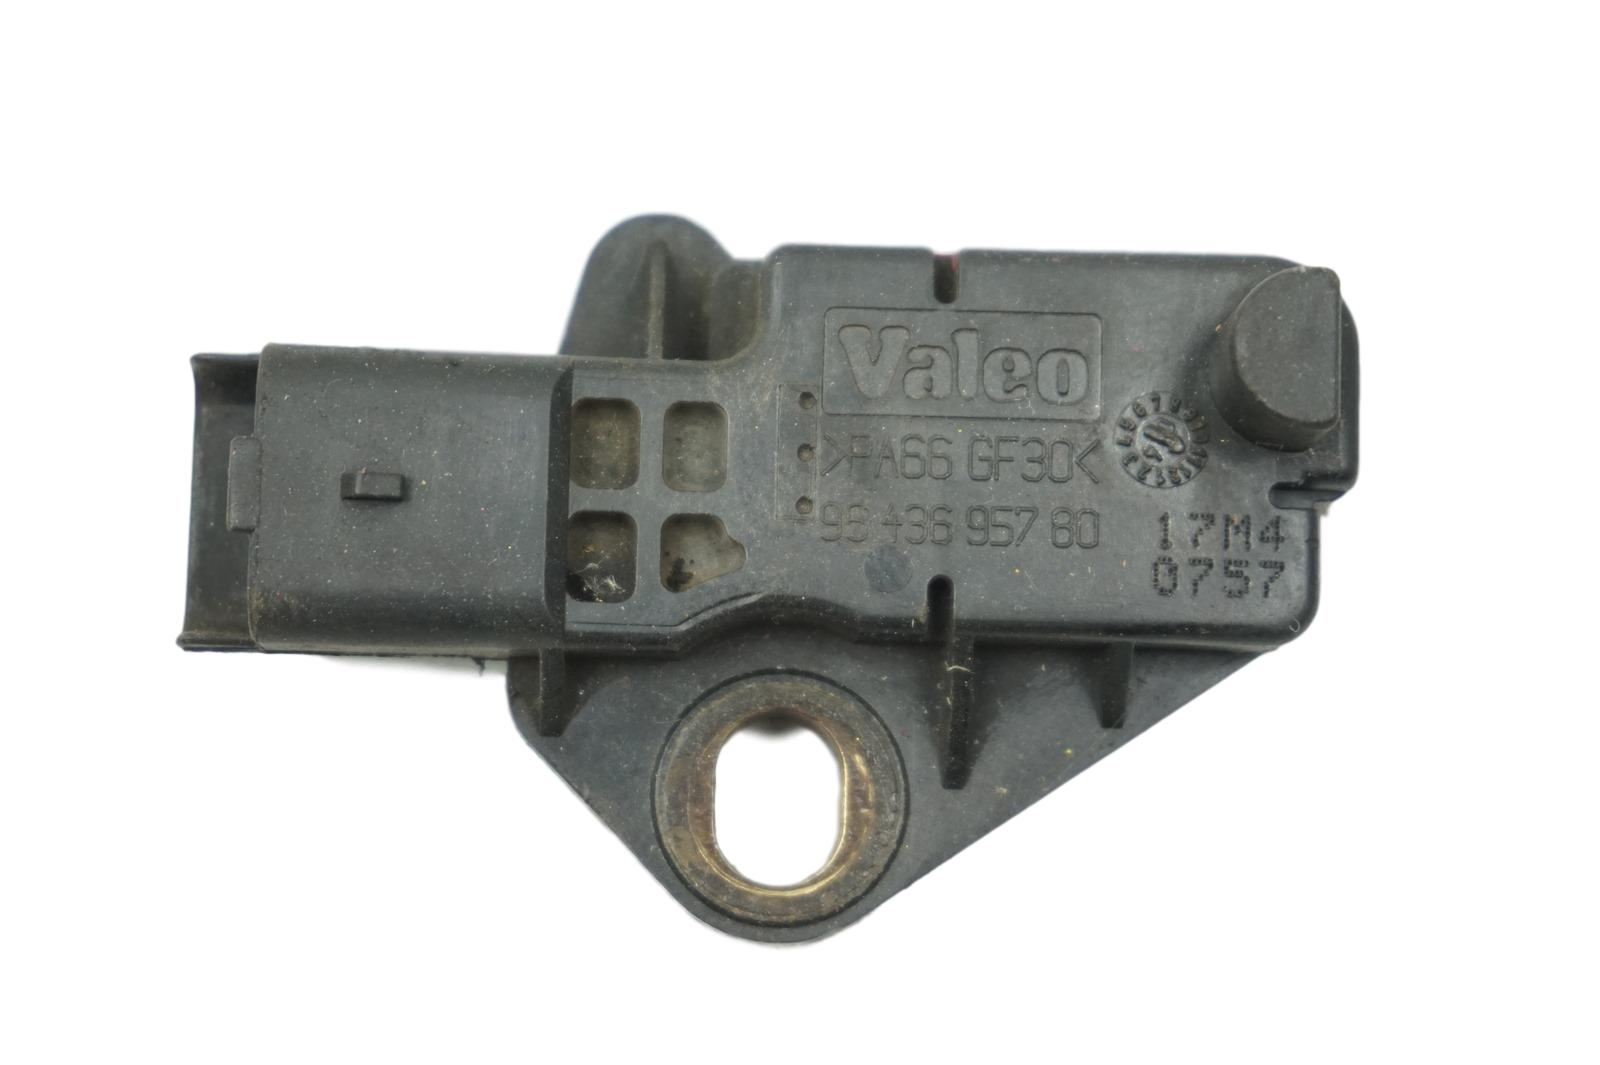 Genuine Volvo Citroen Fiat Ford Peugeot Crankshaft Sensor 2.0D HDI TDI 1920GJ